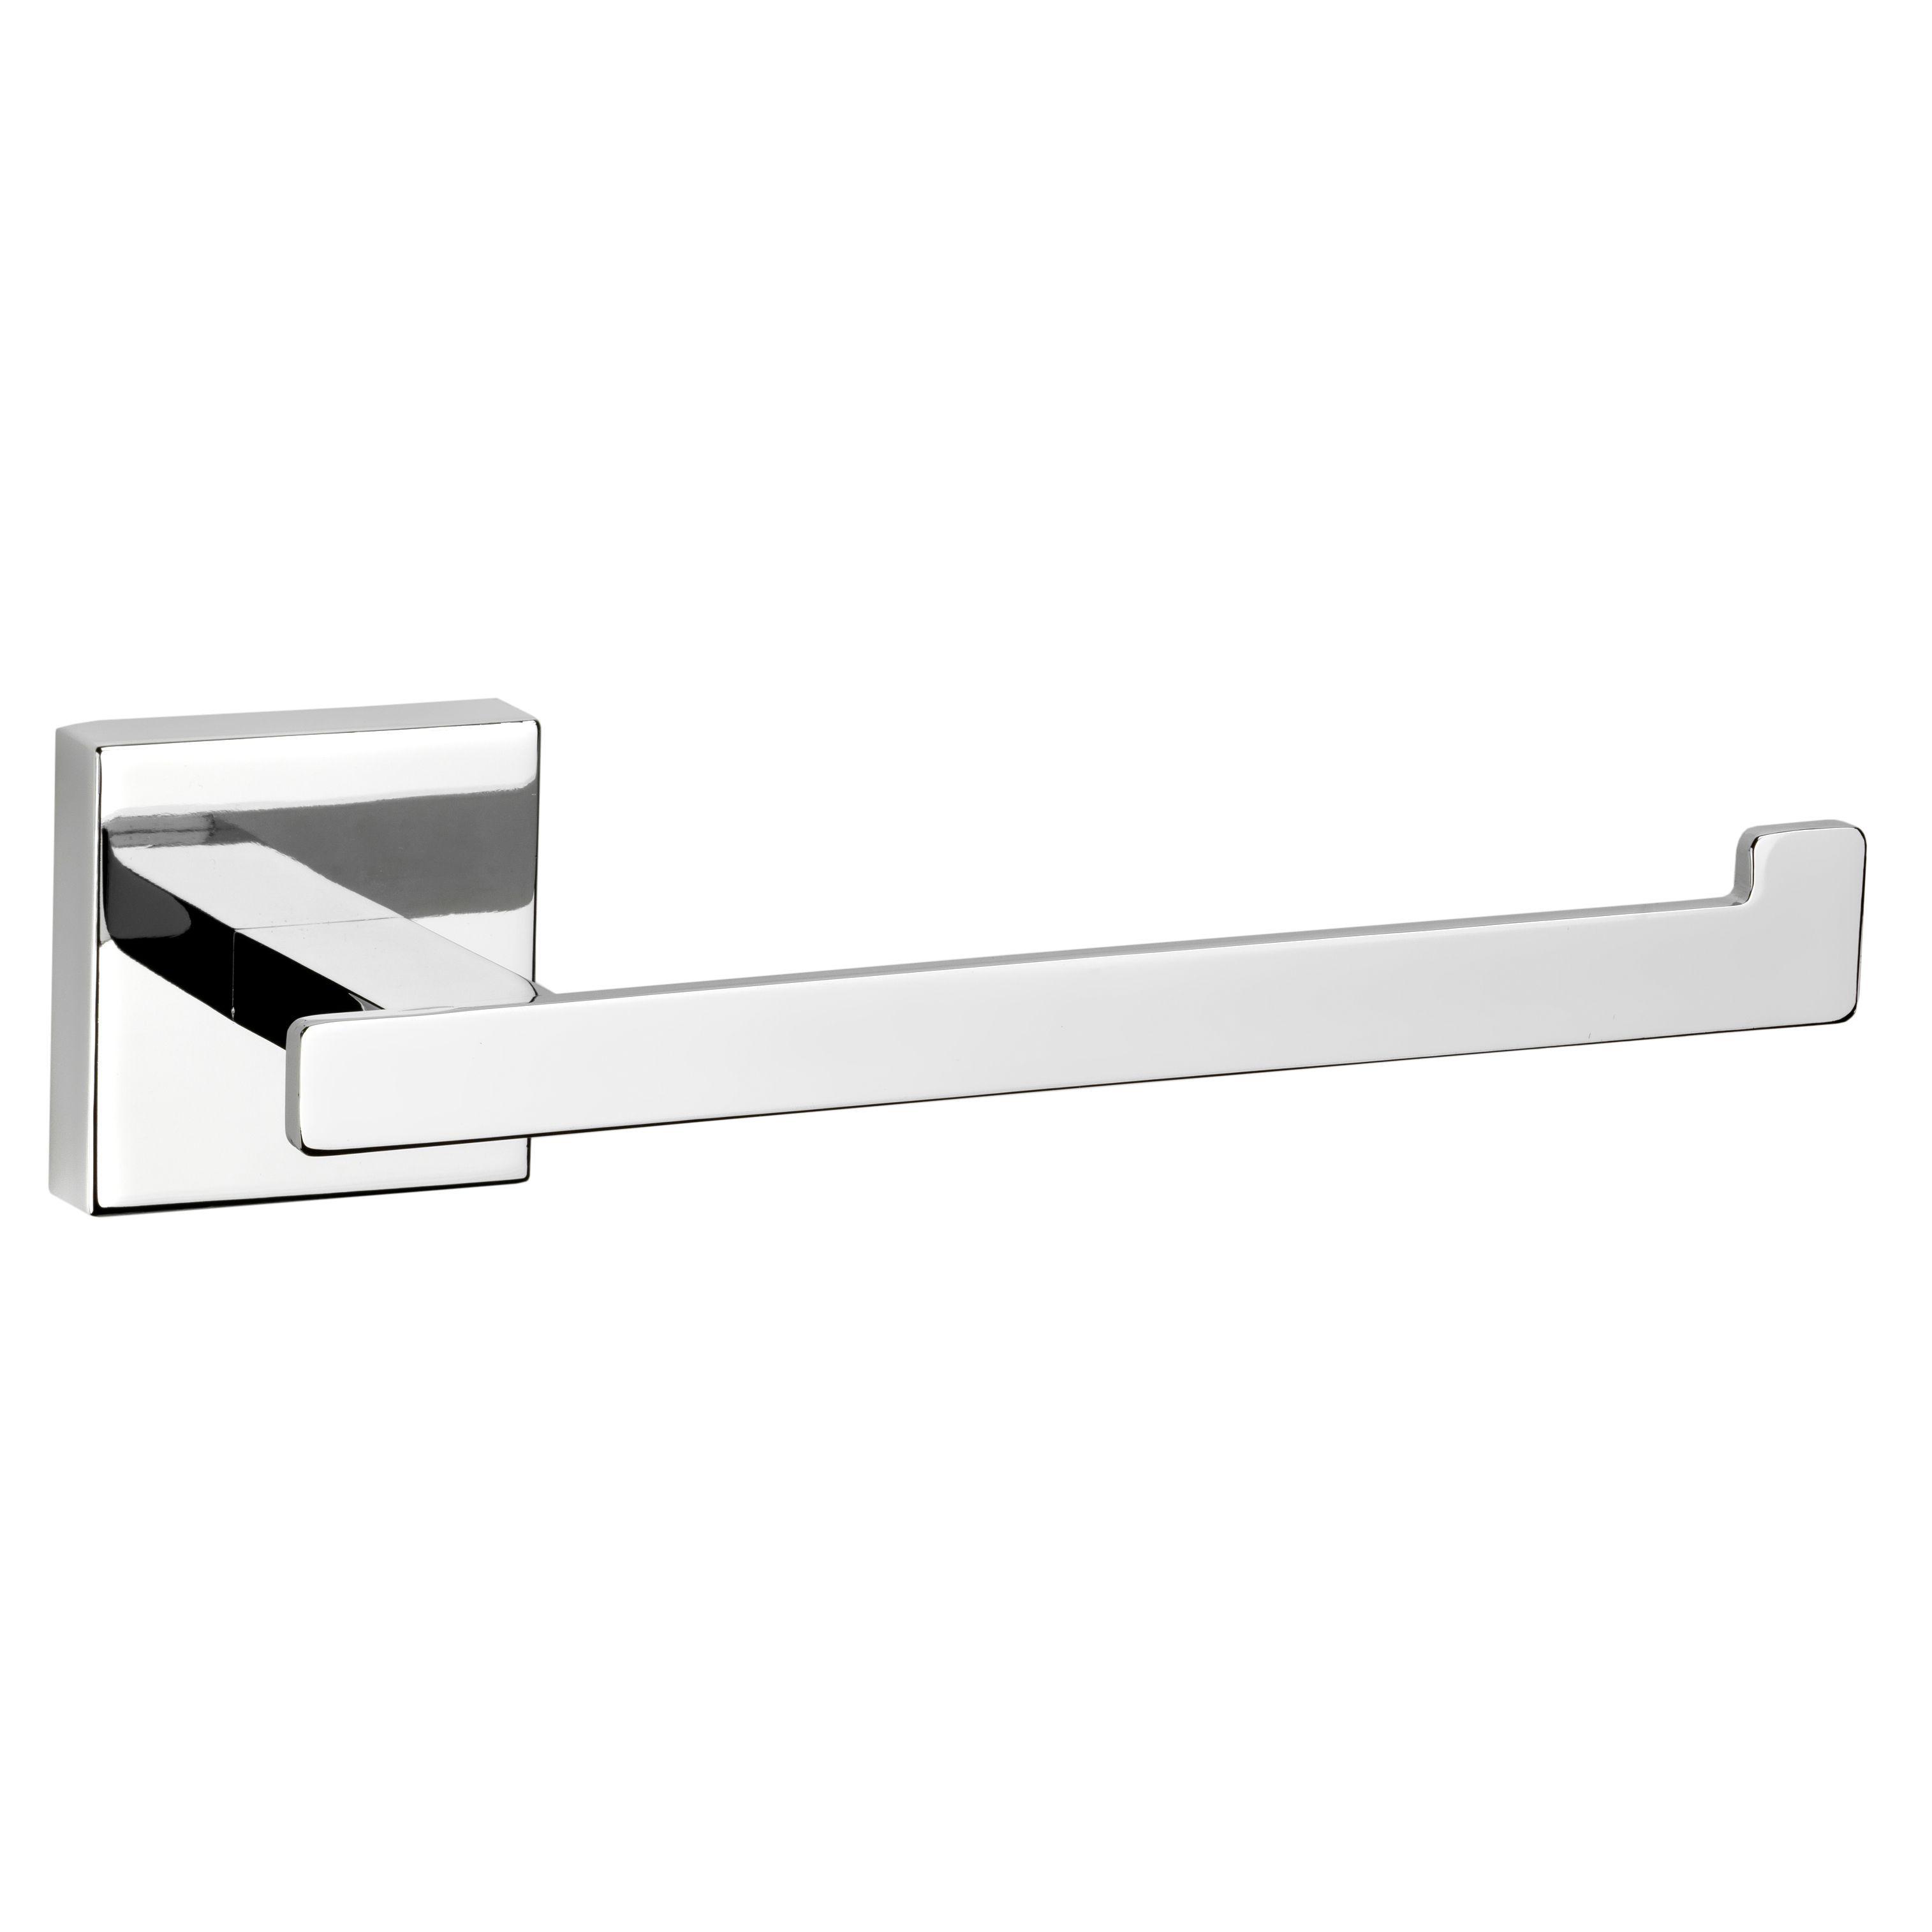 Croydex Flexi Fix Cheadle Silver Wall Mounted Chrome Effect Toilet Roll Holder W 190mm Departments Diy At B A Toilet Roll Holder Silver Walls Toilet Roll